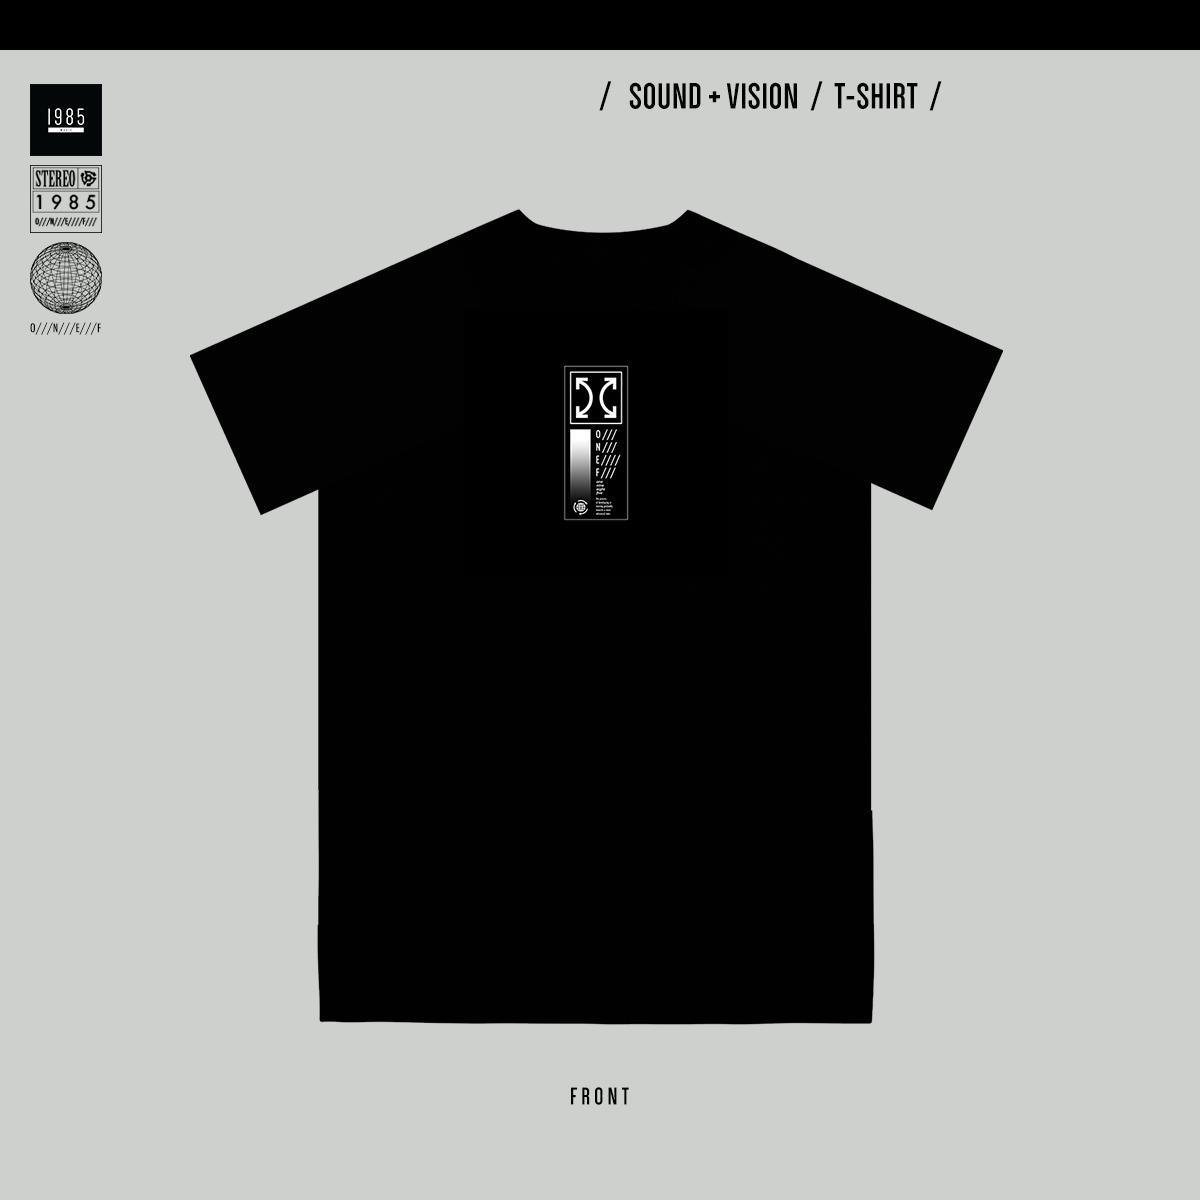 Sound + Vision T-Shirt